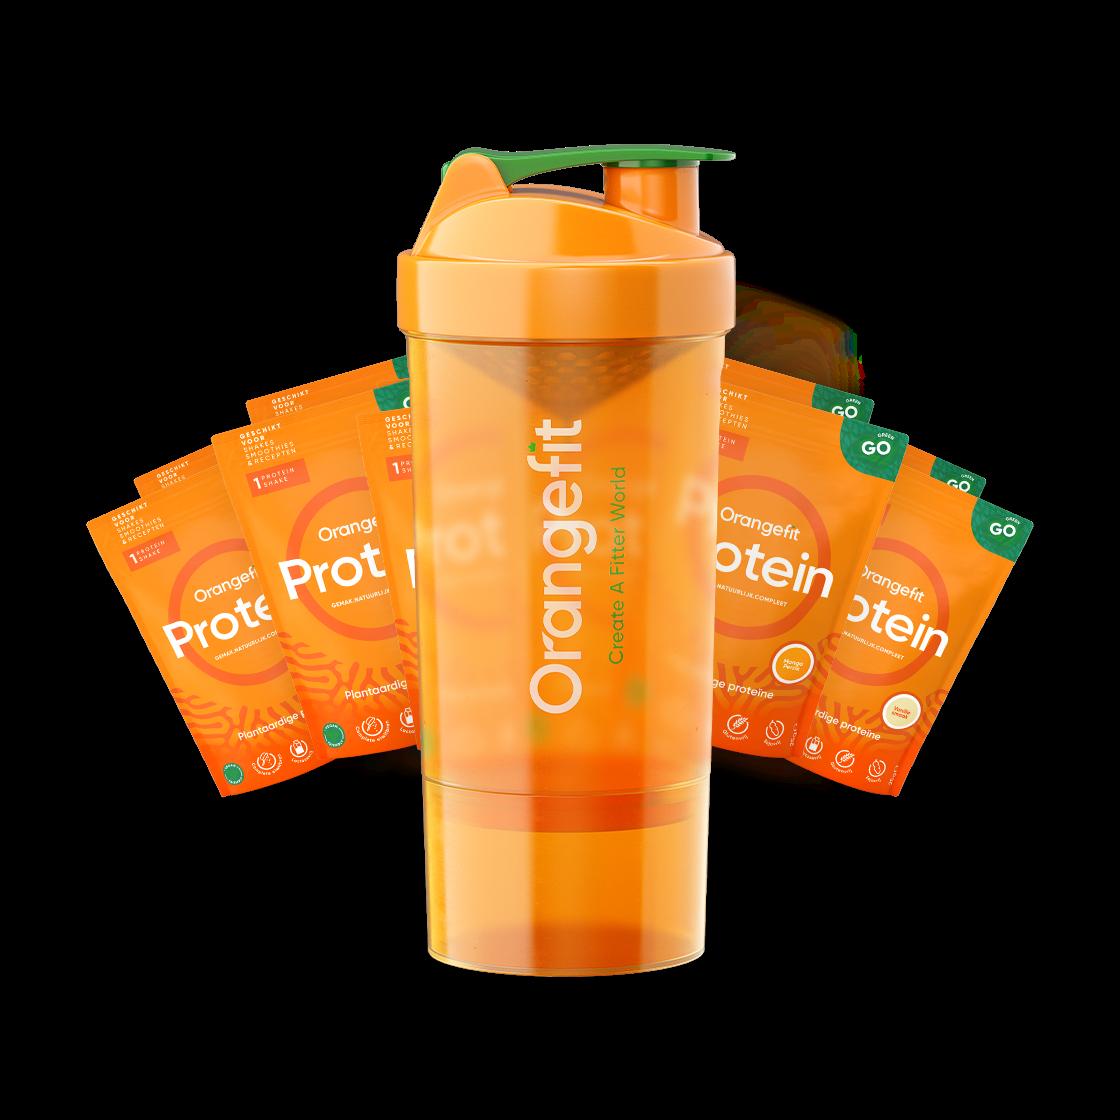 Protein Starterspakket